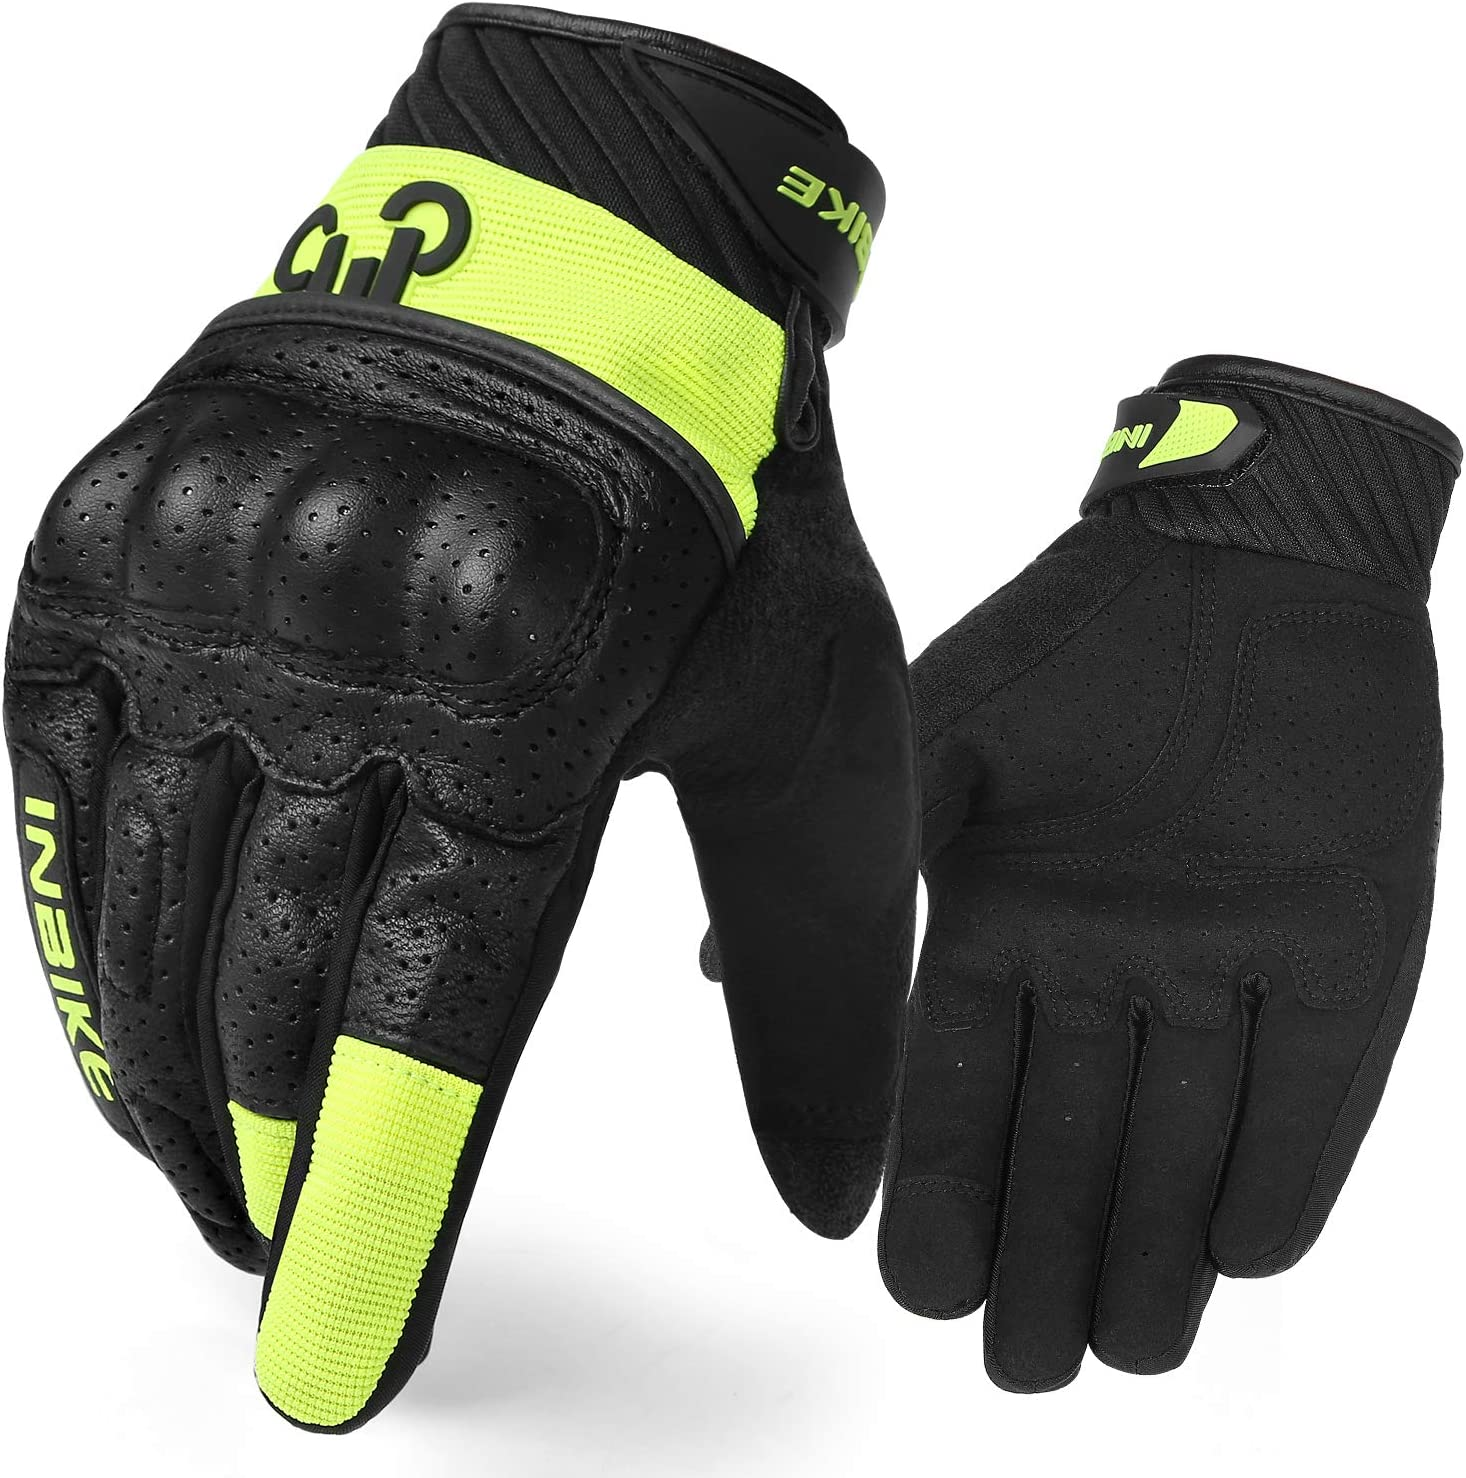 3mm EVA Palm Pad Motorbike Gloves Full Finger Black Medium INBIKE Motorcycle Gloves